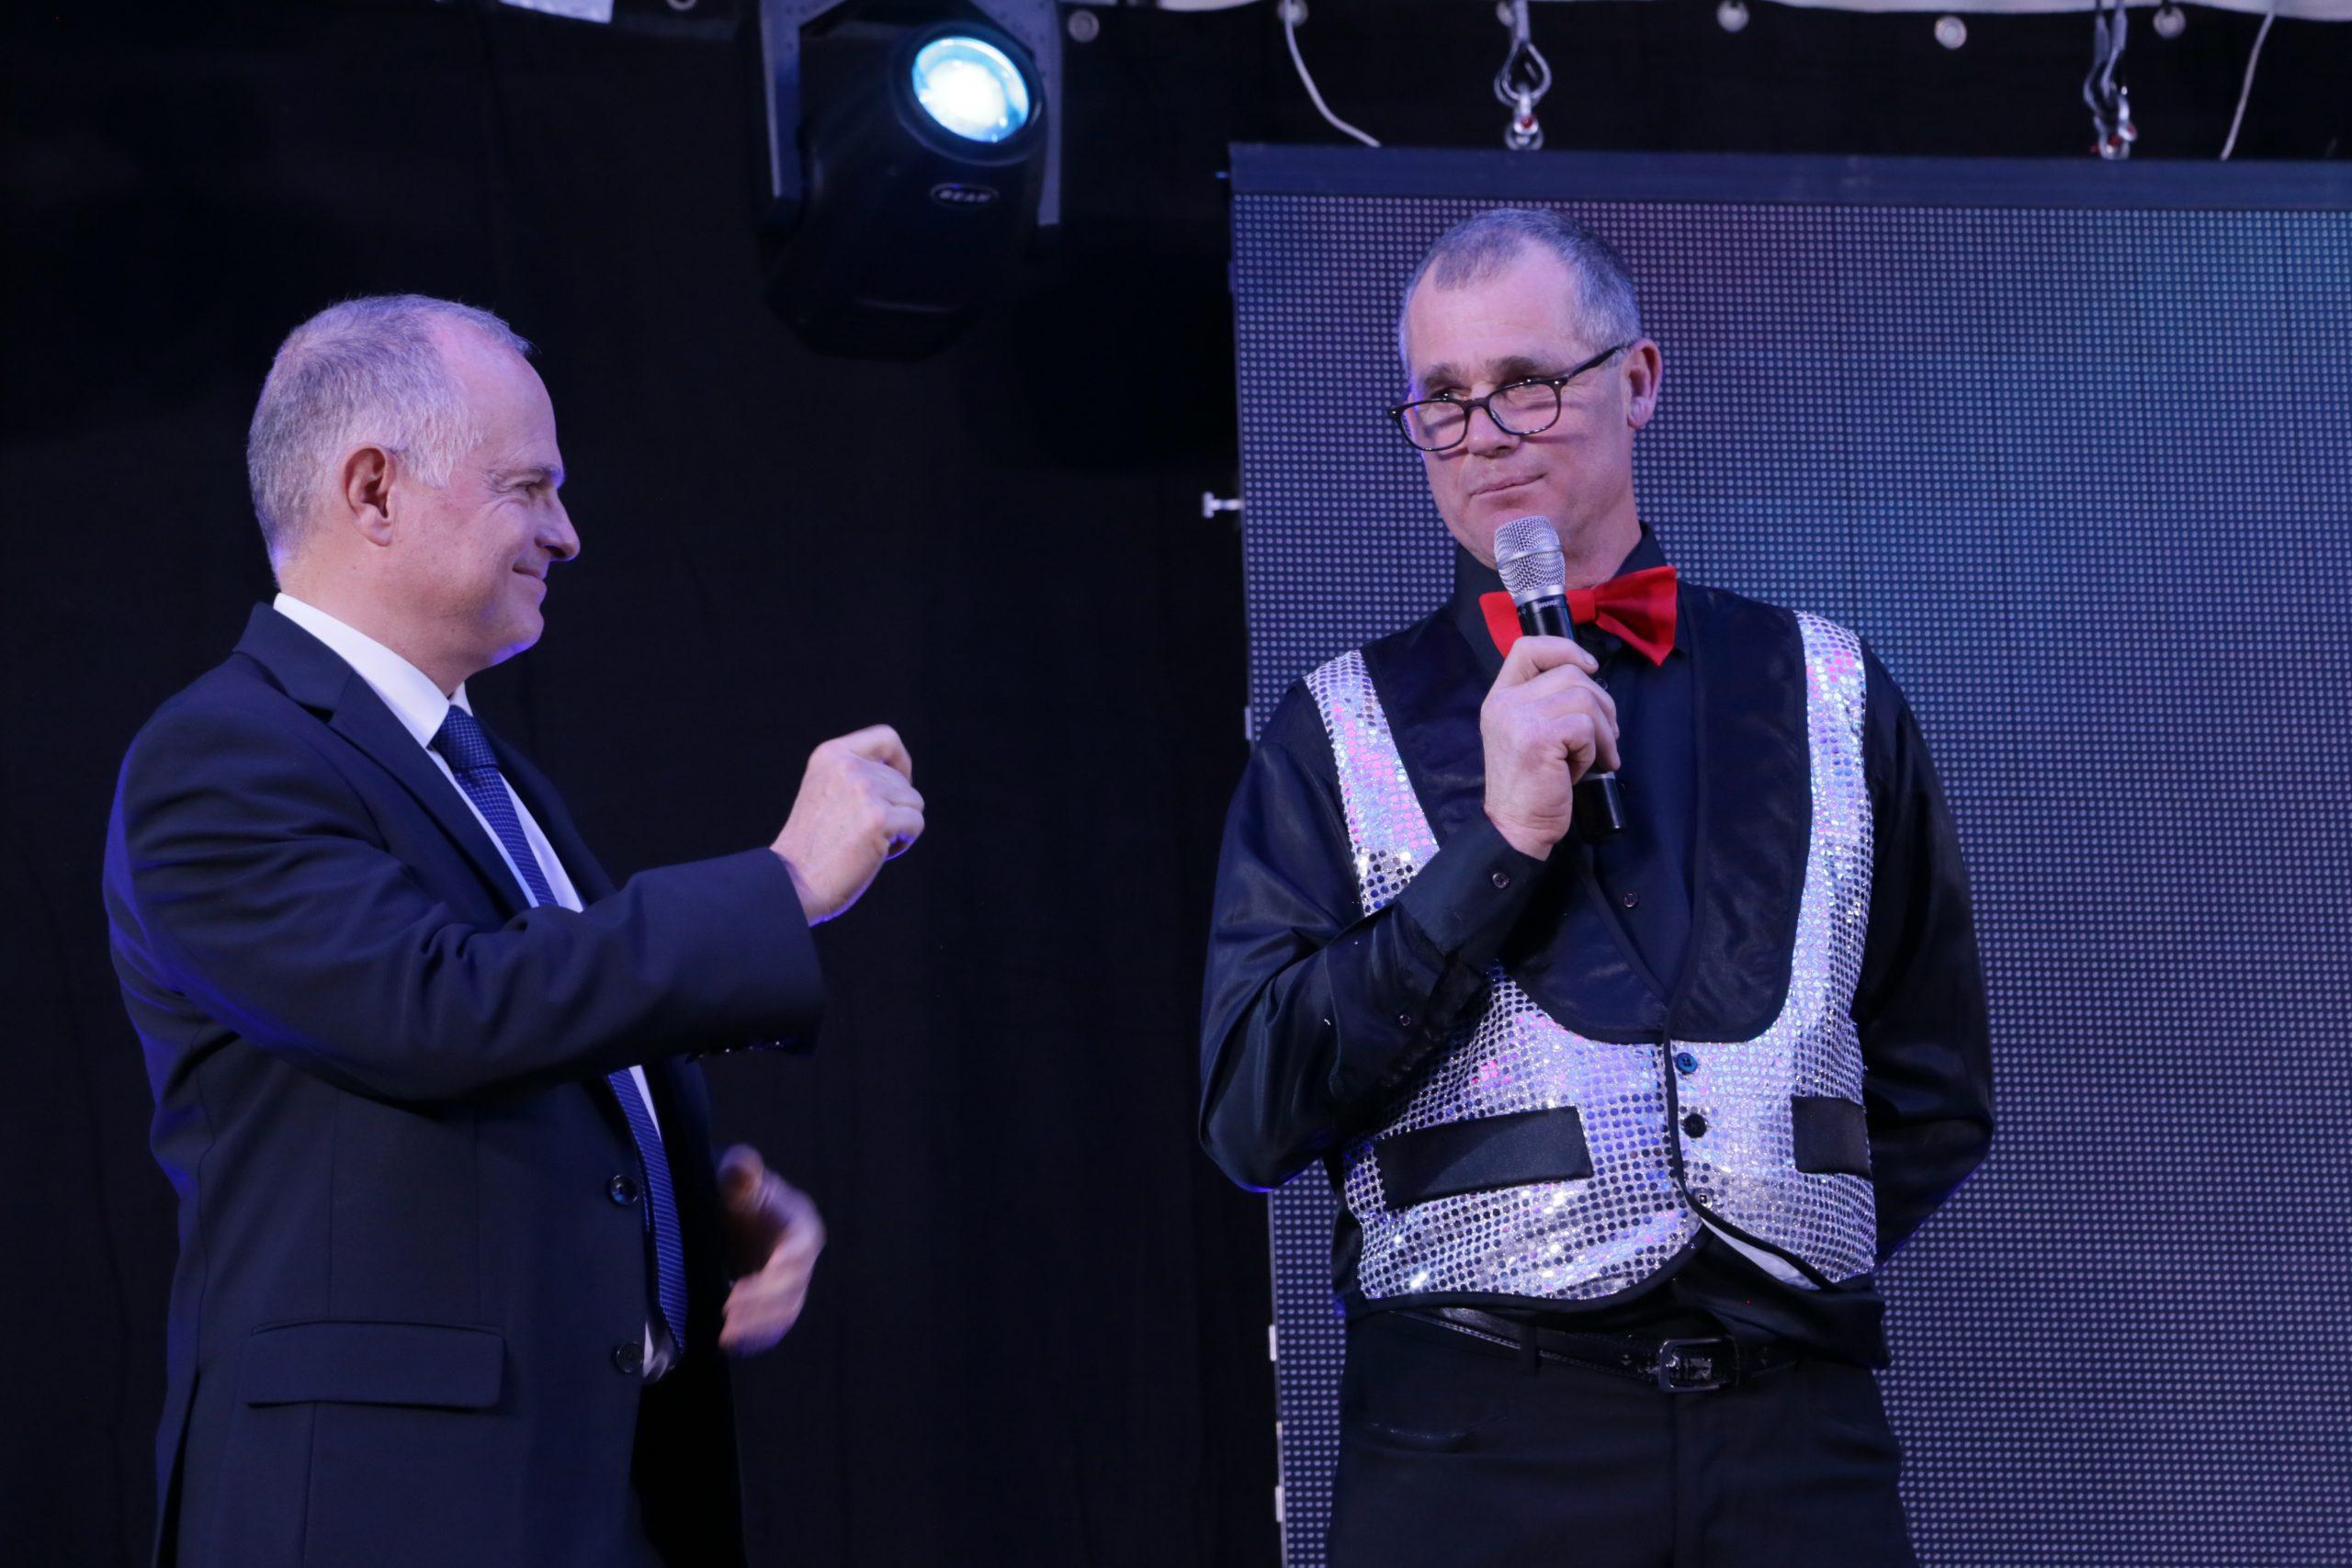 discours-president-beaujolais-tarare